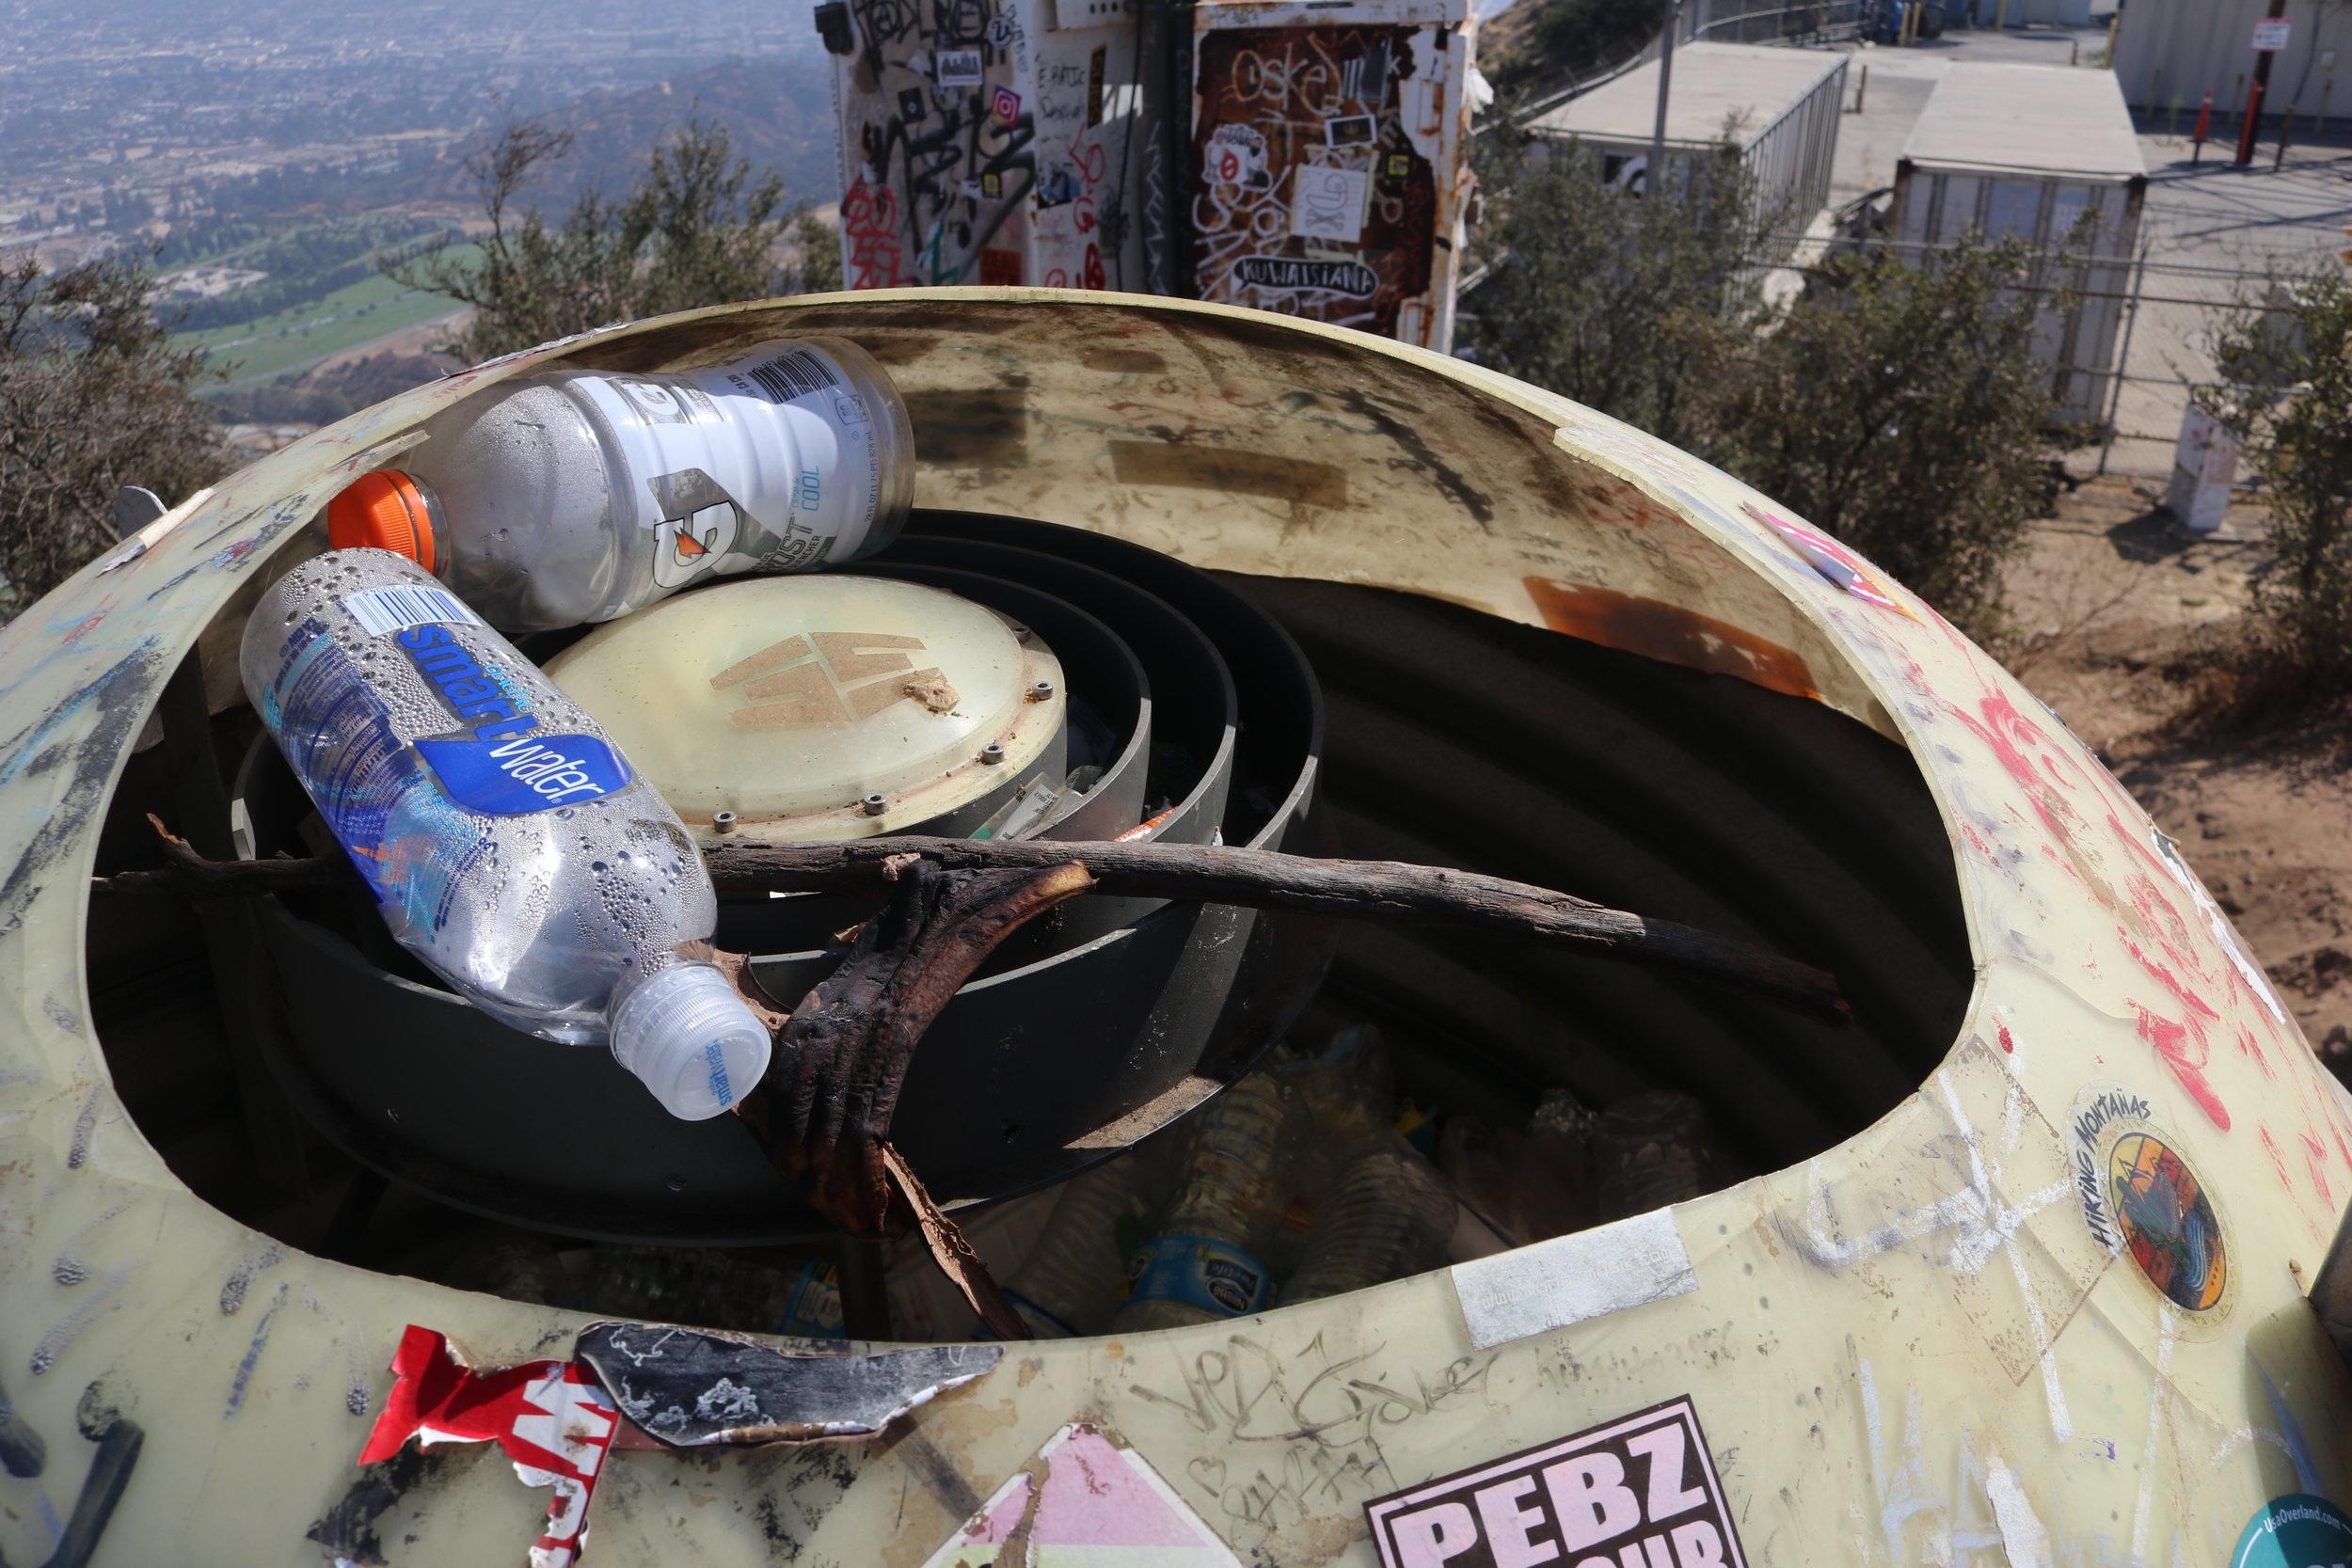 Doesn't it look like a trashcan!?